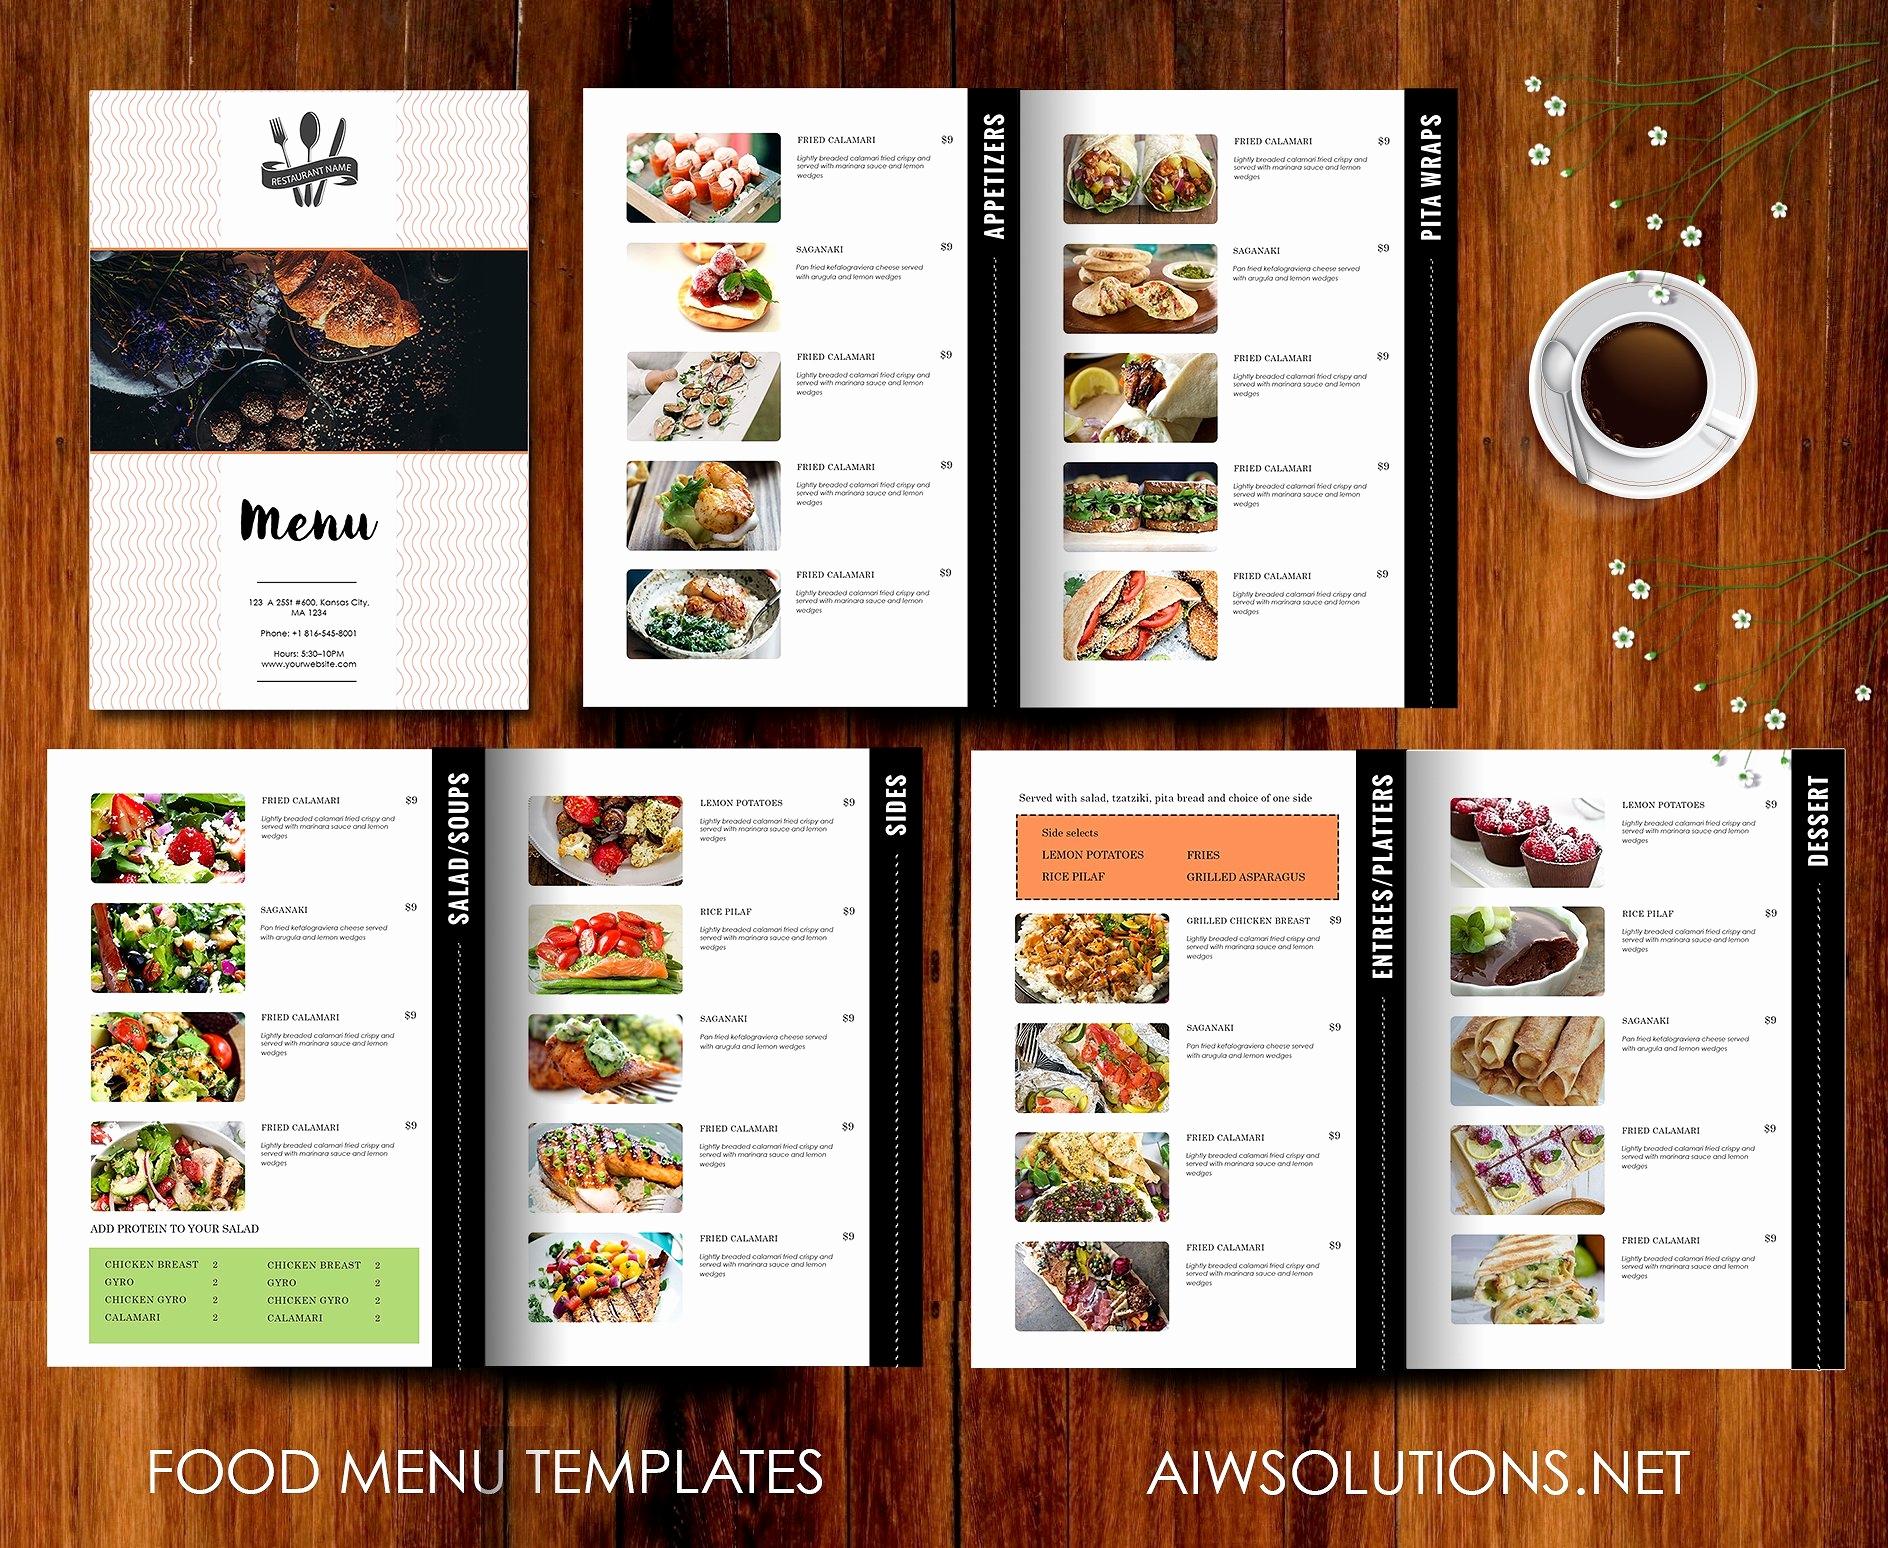 Free Restaurant Menu Templates Beautiful 9 Essential Restaurant Menu Design Tips